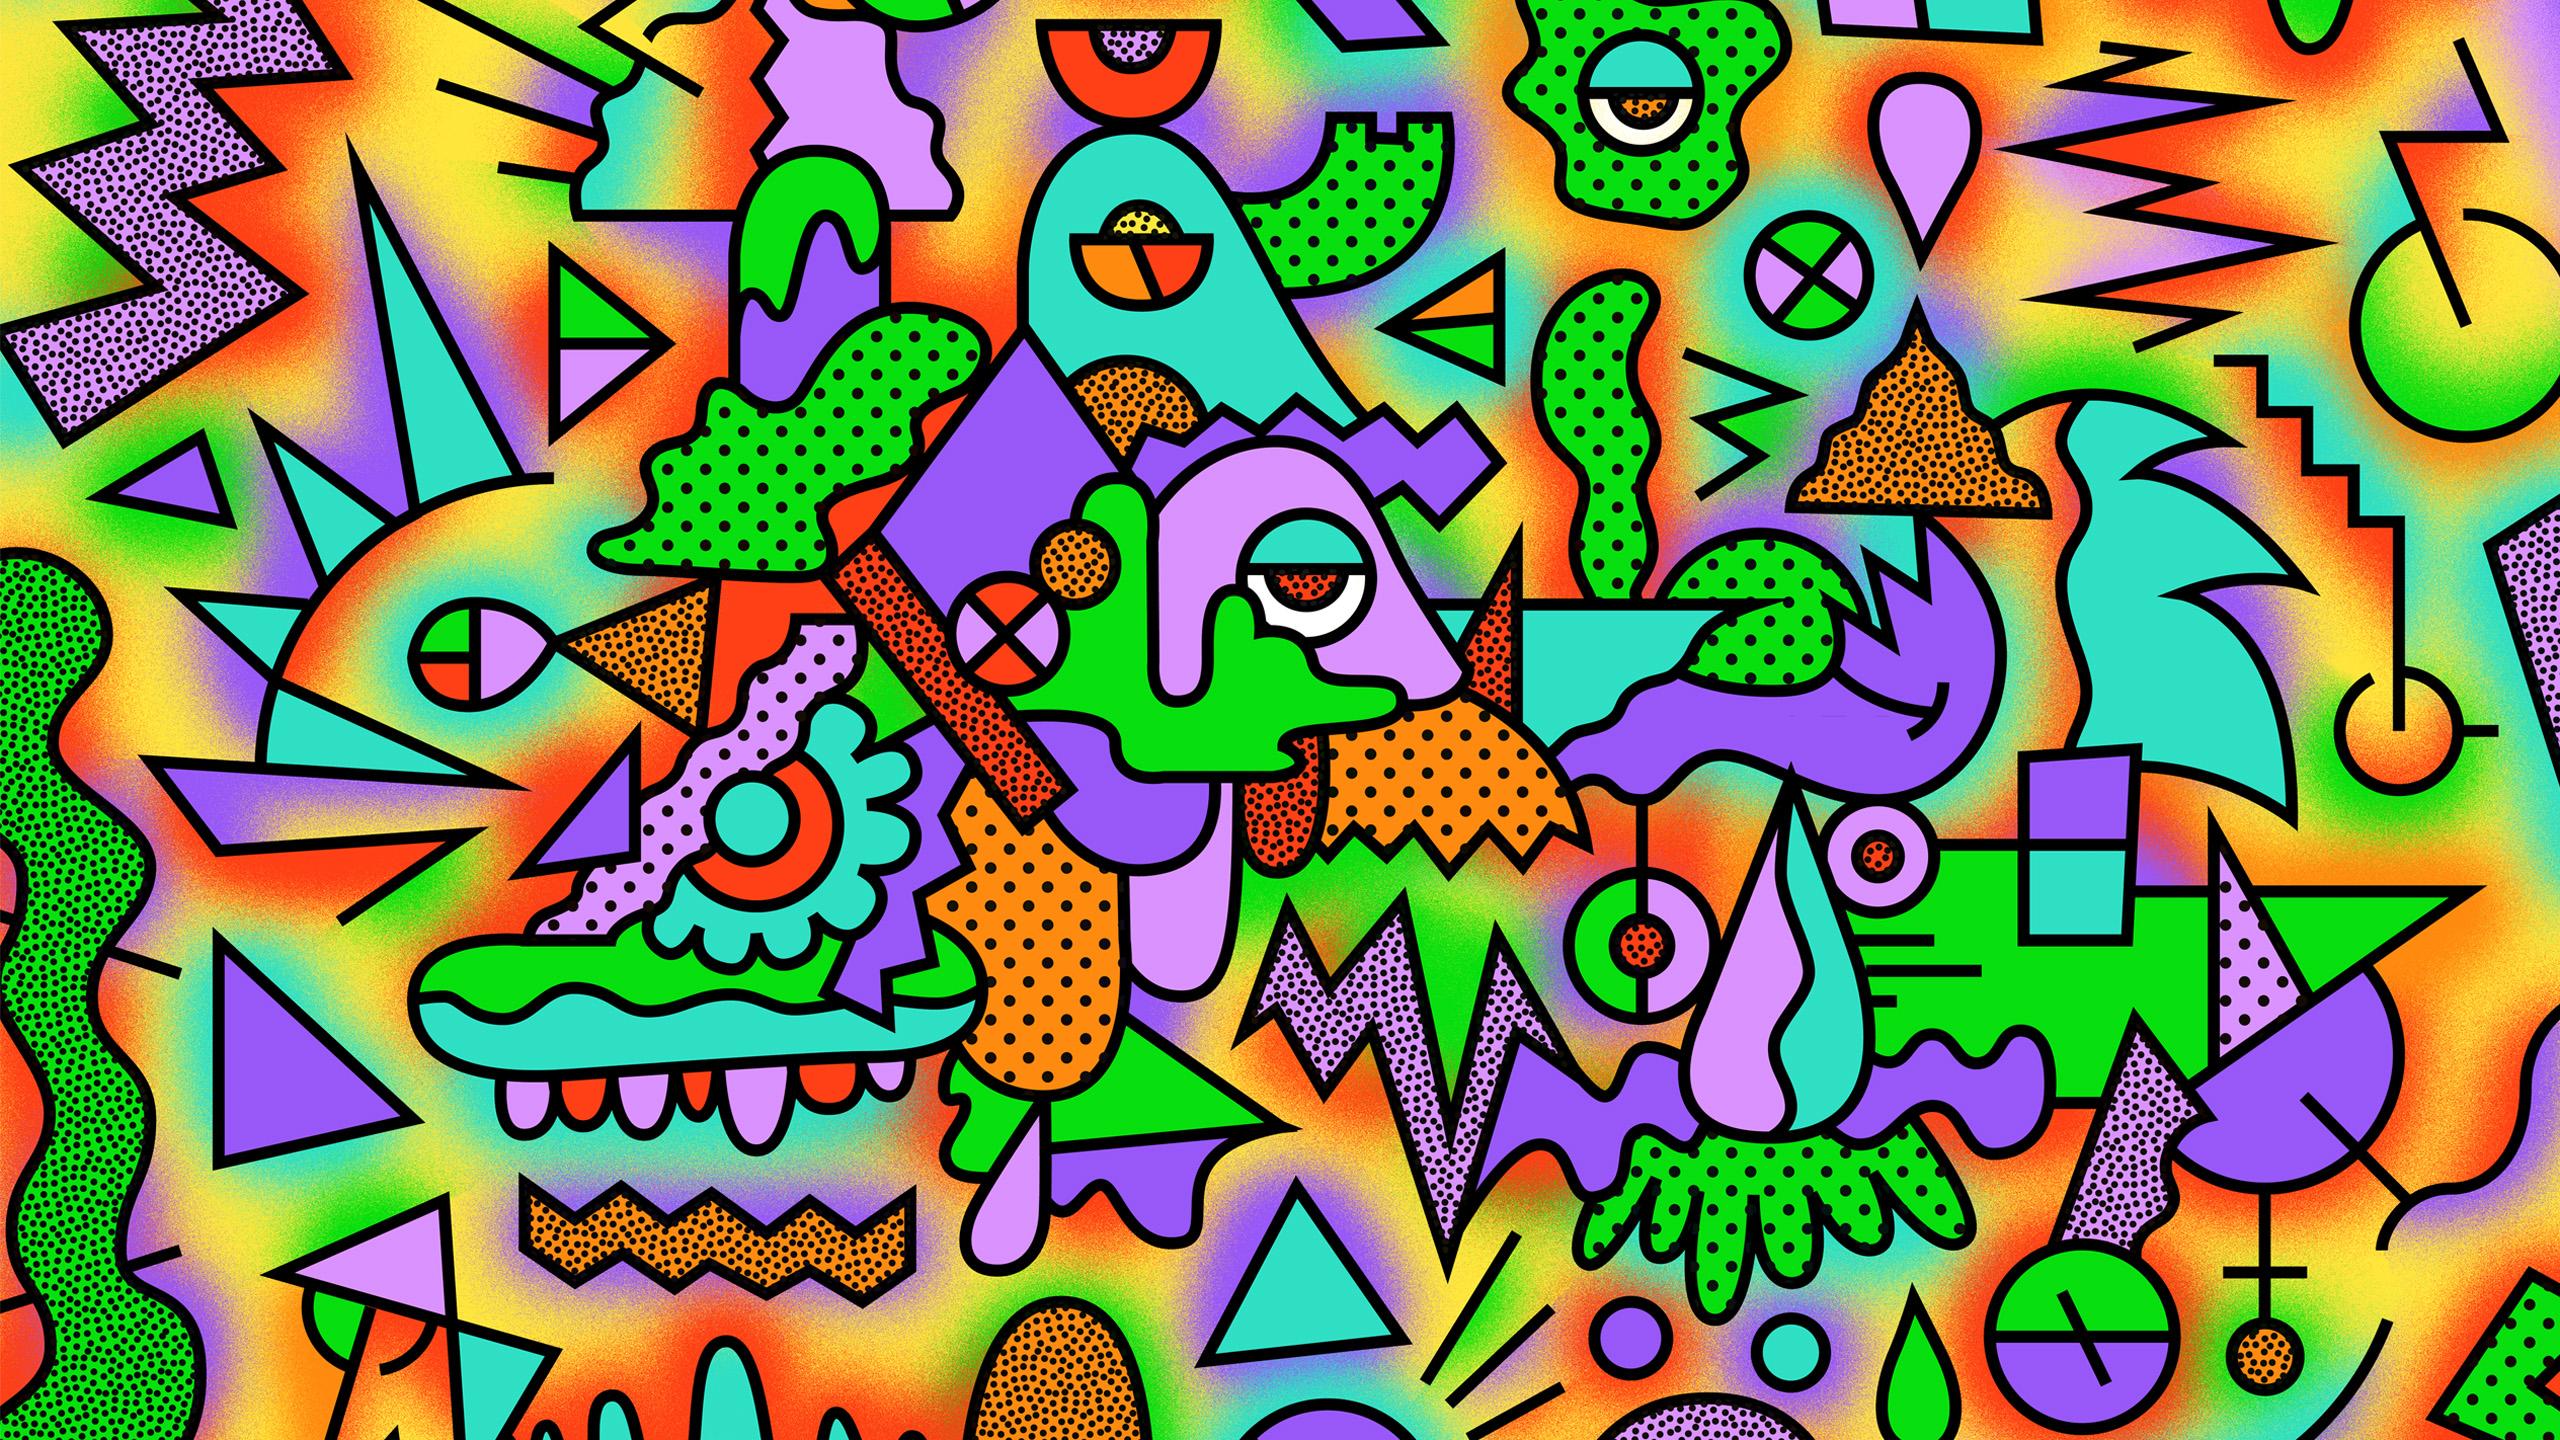 Free Download Skiphursh Wallpaper 90s Style Nanda Mood Board